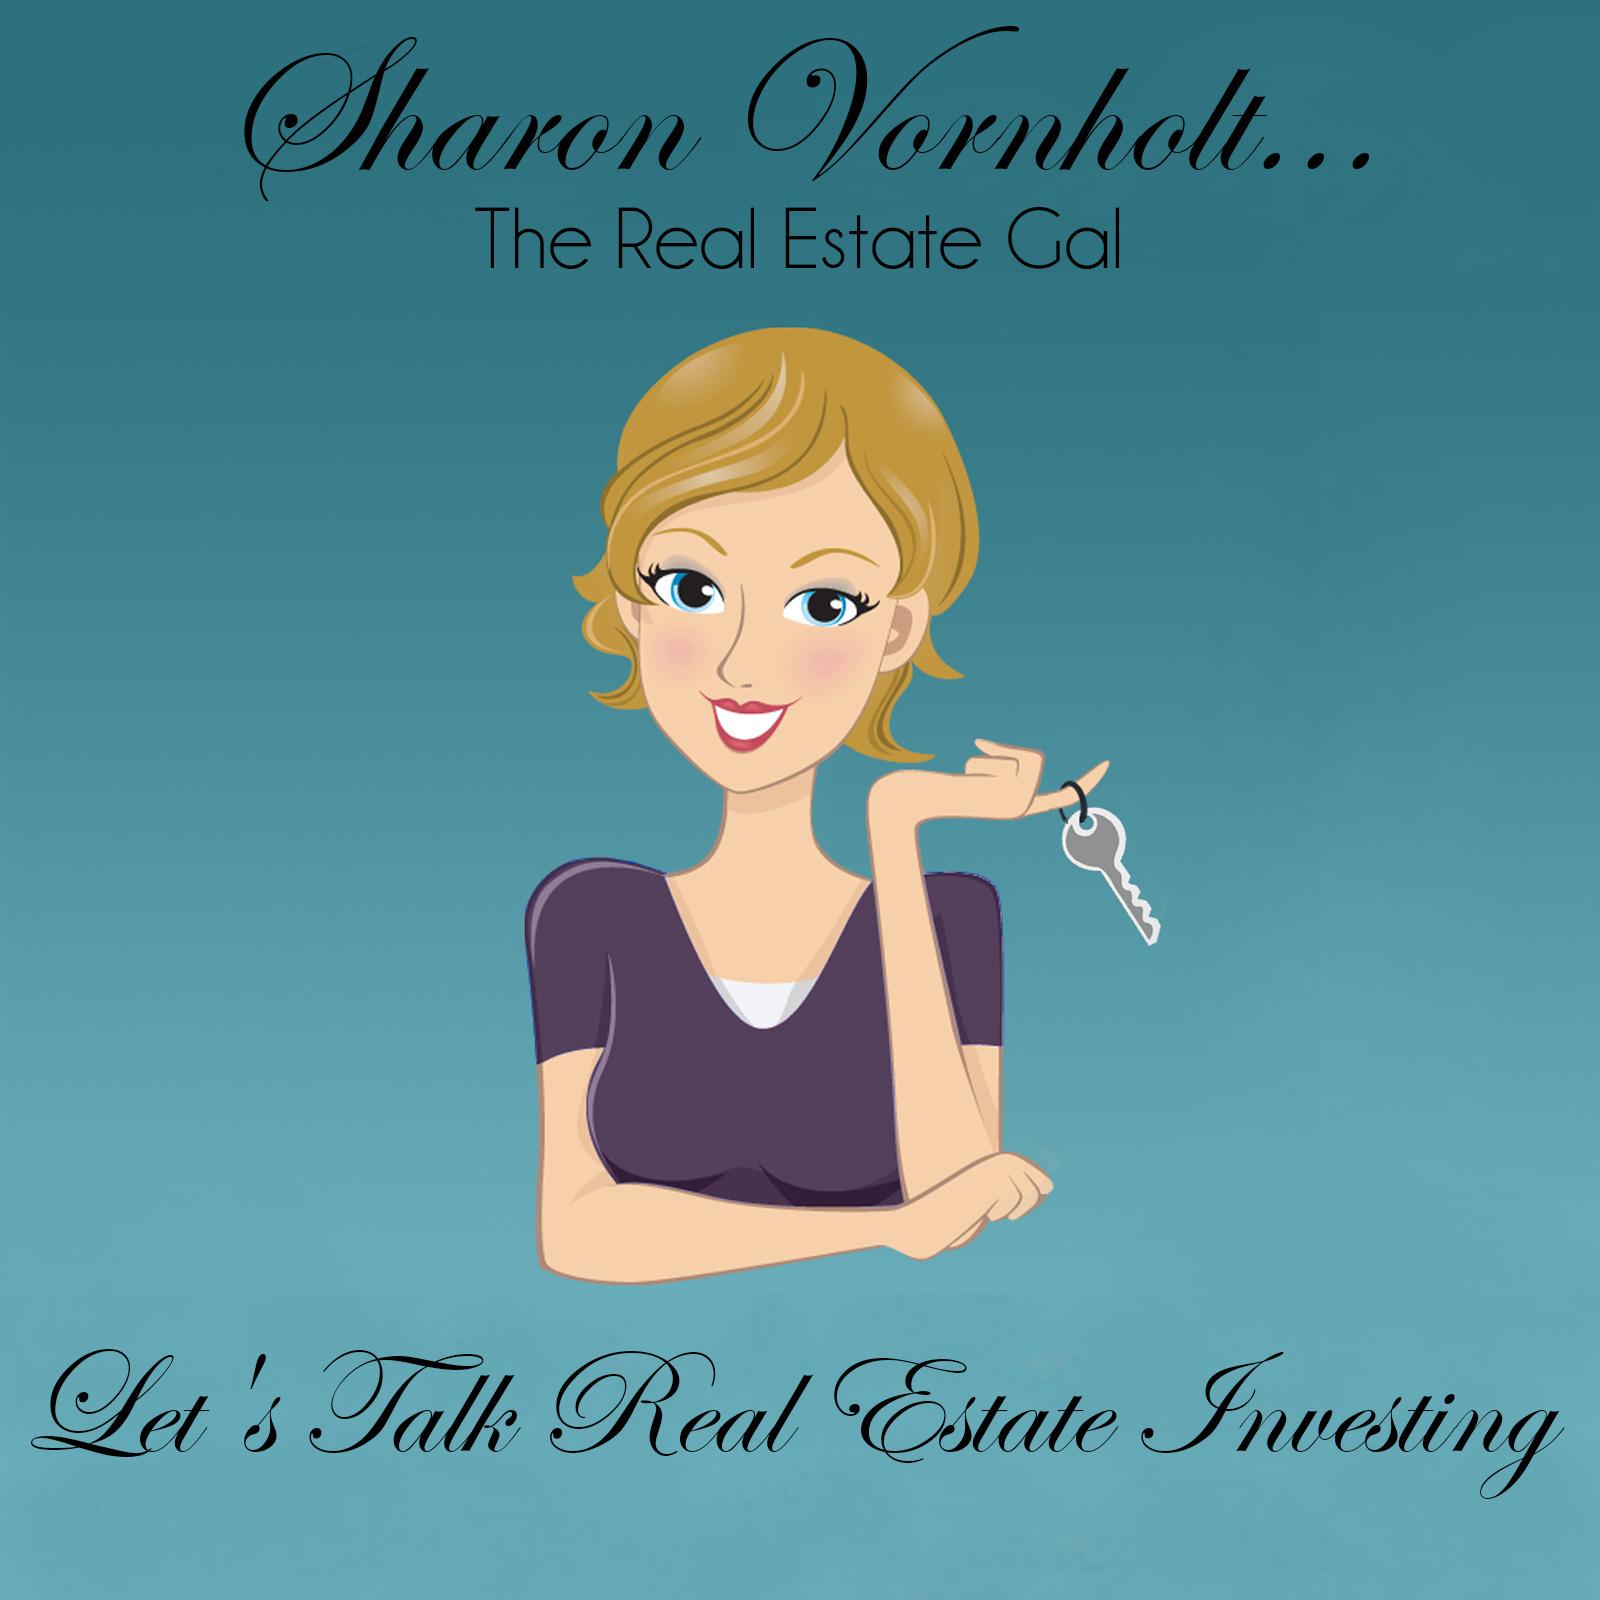 Let's Talk Real Estate Investing